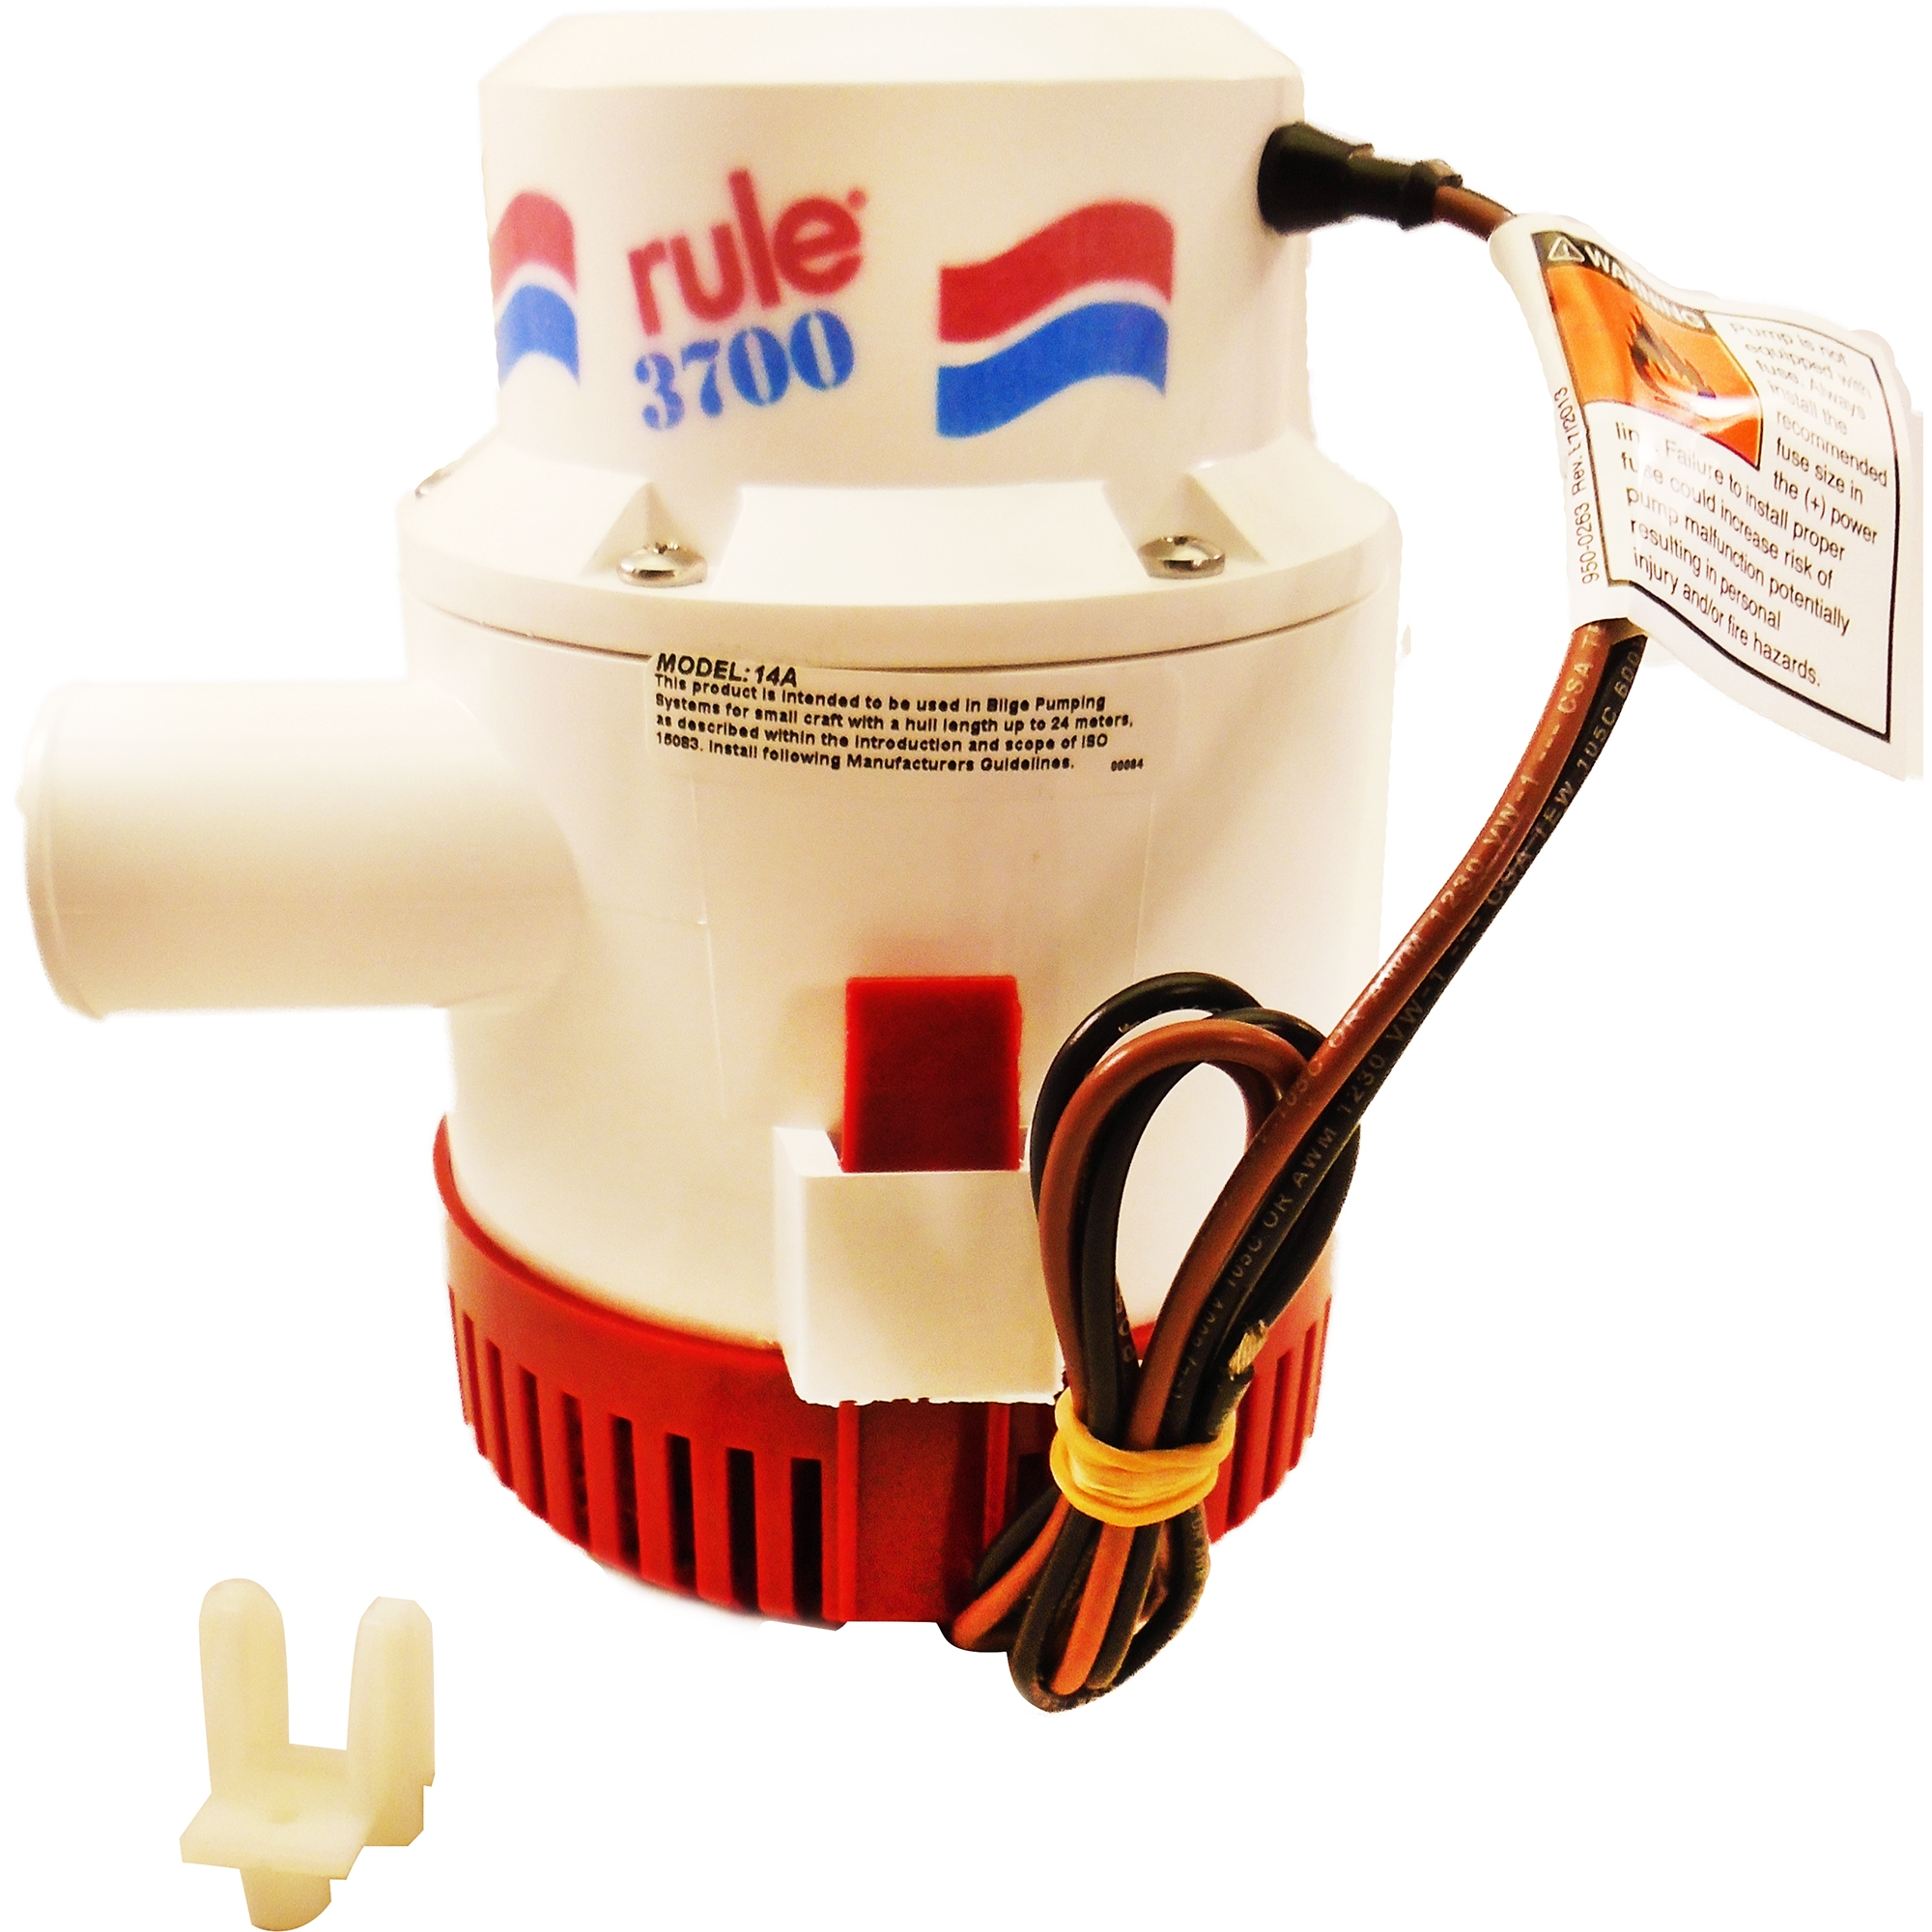 14A Non-Automatic Rule Marine 3700 GPH Bilge Pump 12 Volt